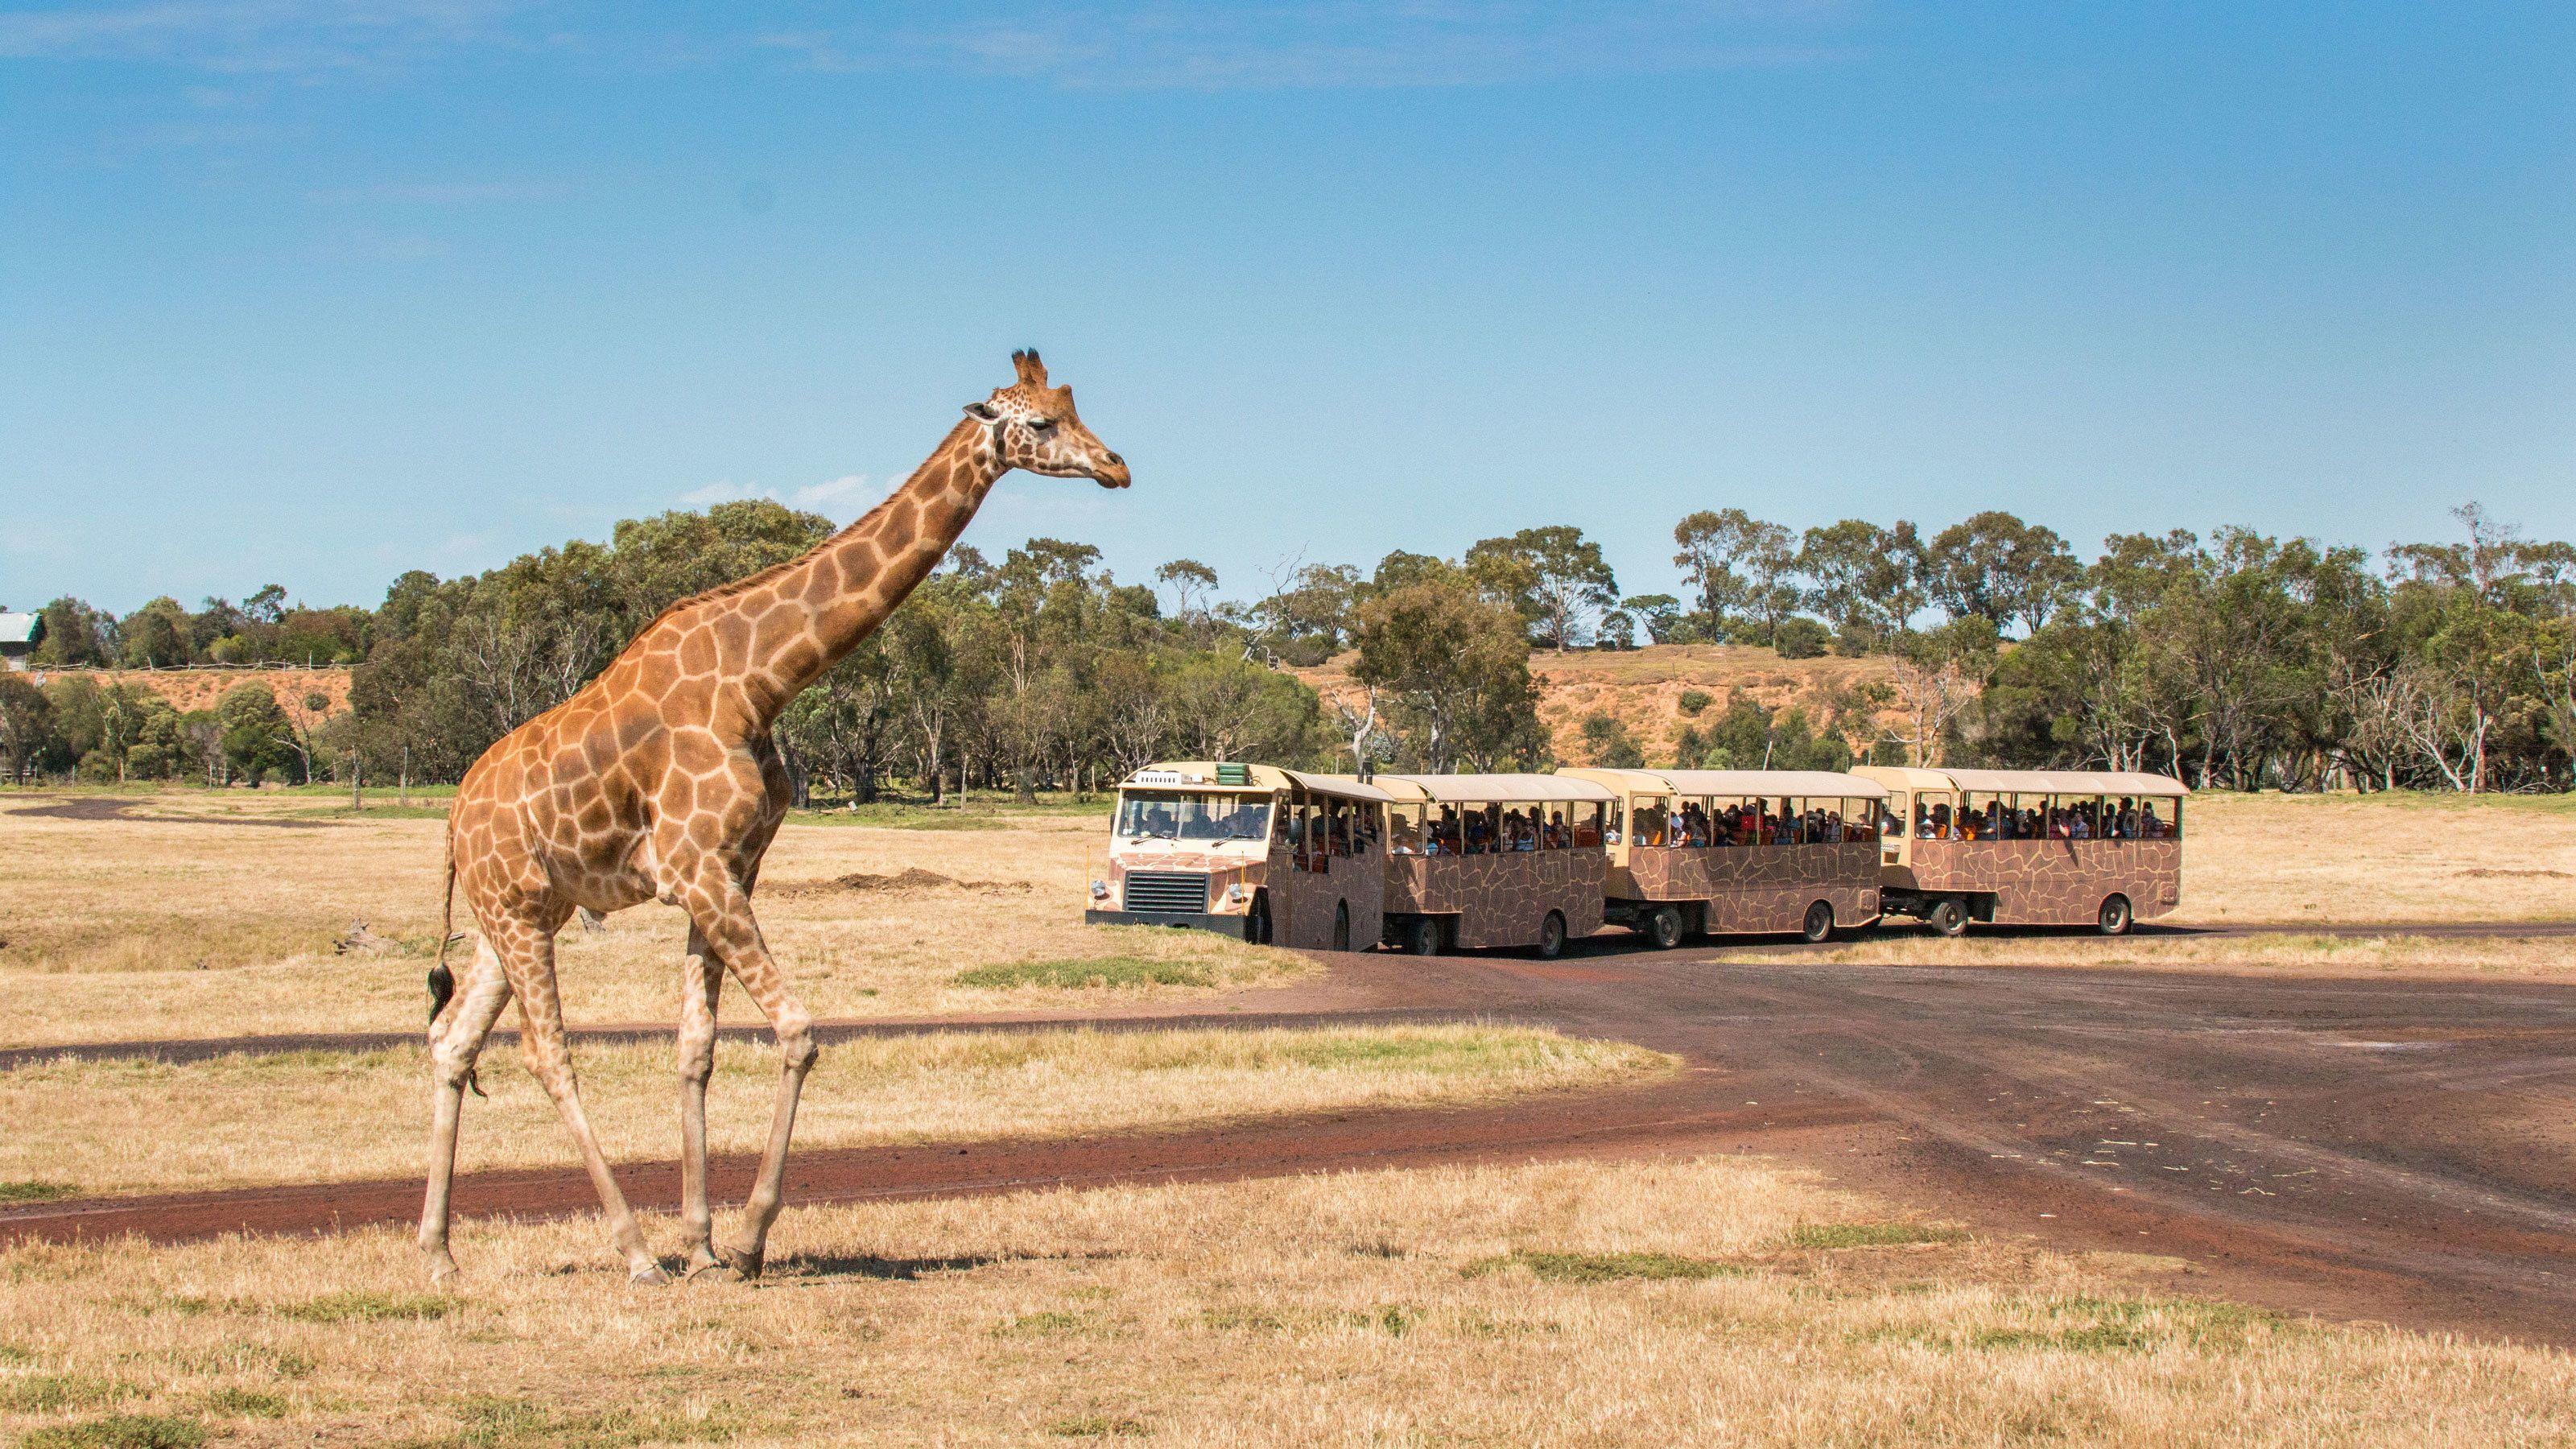 Giraffe at the Werribee Open Range Zoo